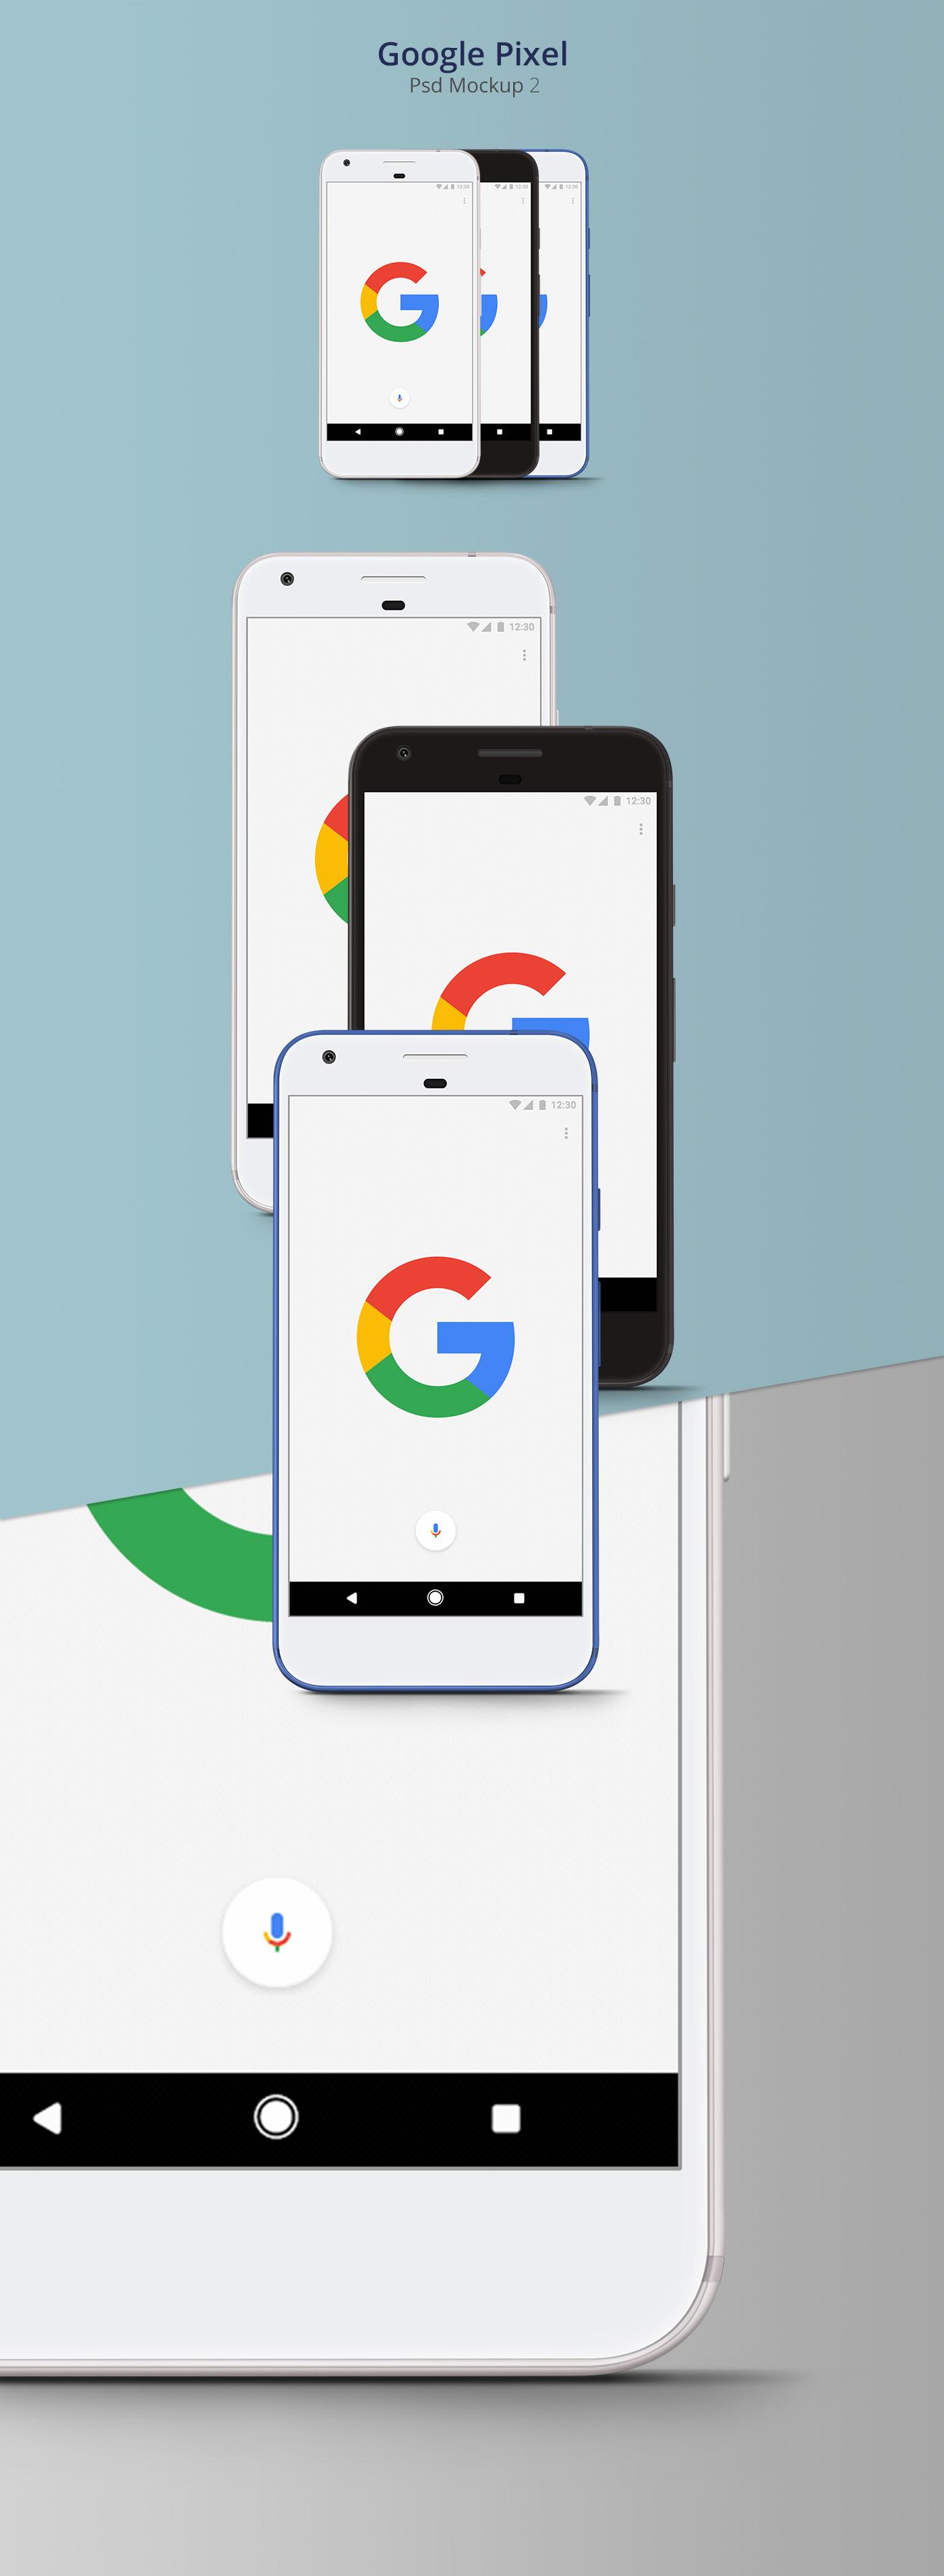 Pixel Psd,Google Pixel Psd,Pixel Psd Mockup,psd mockup,madeby google,free mockup ,mock-up